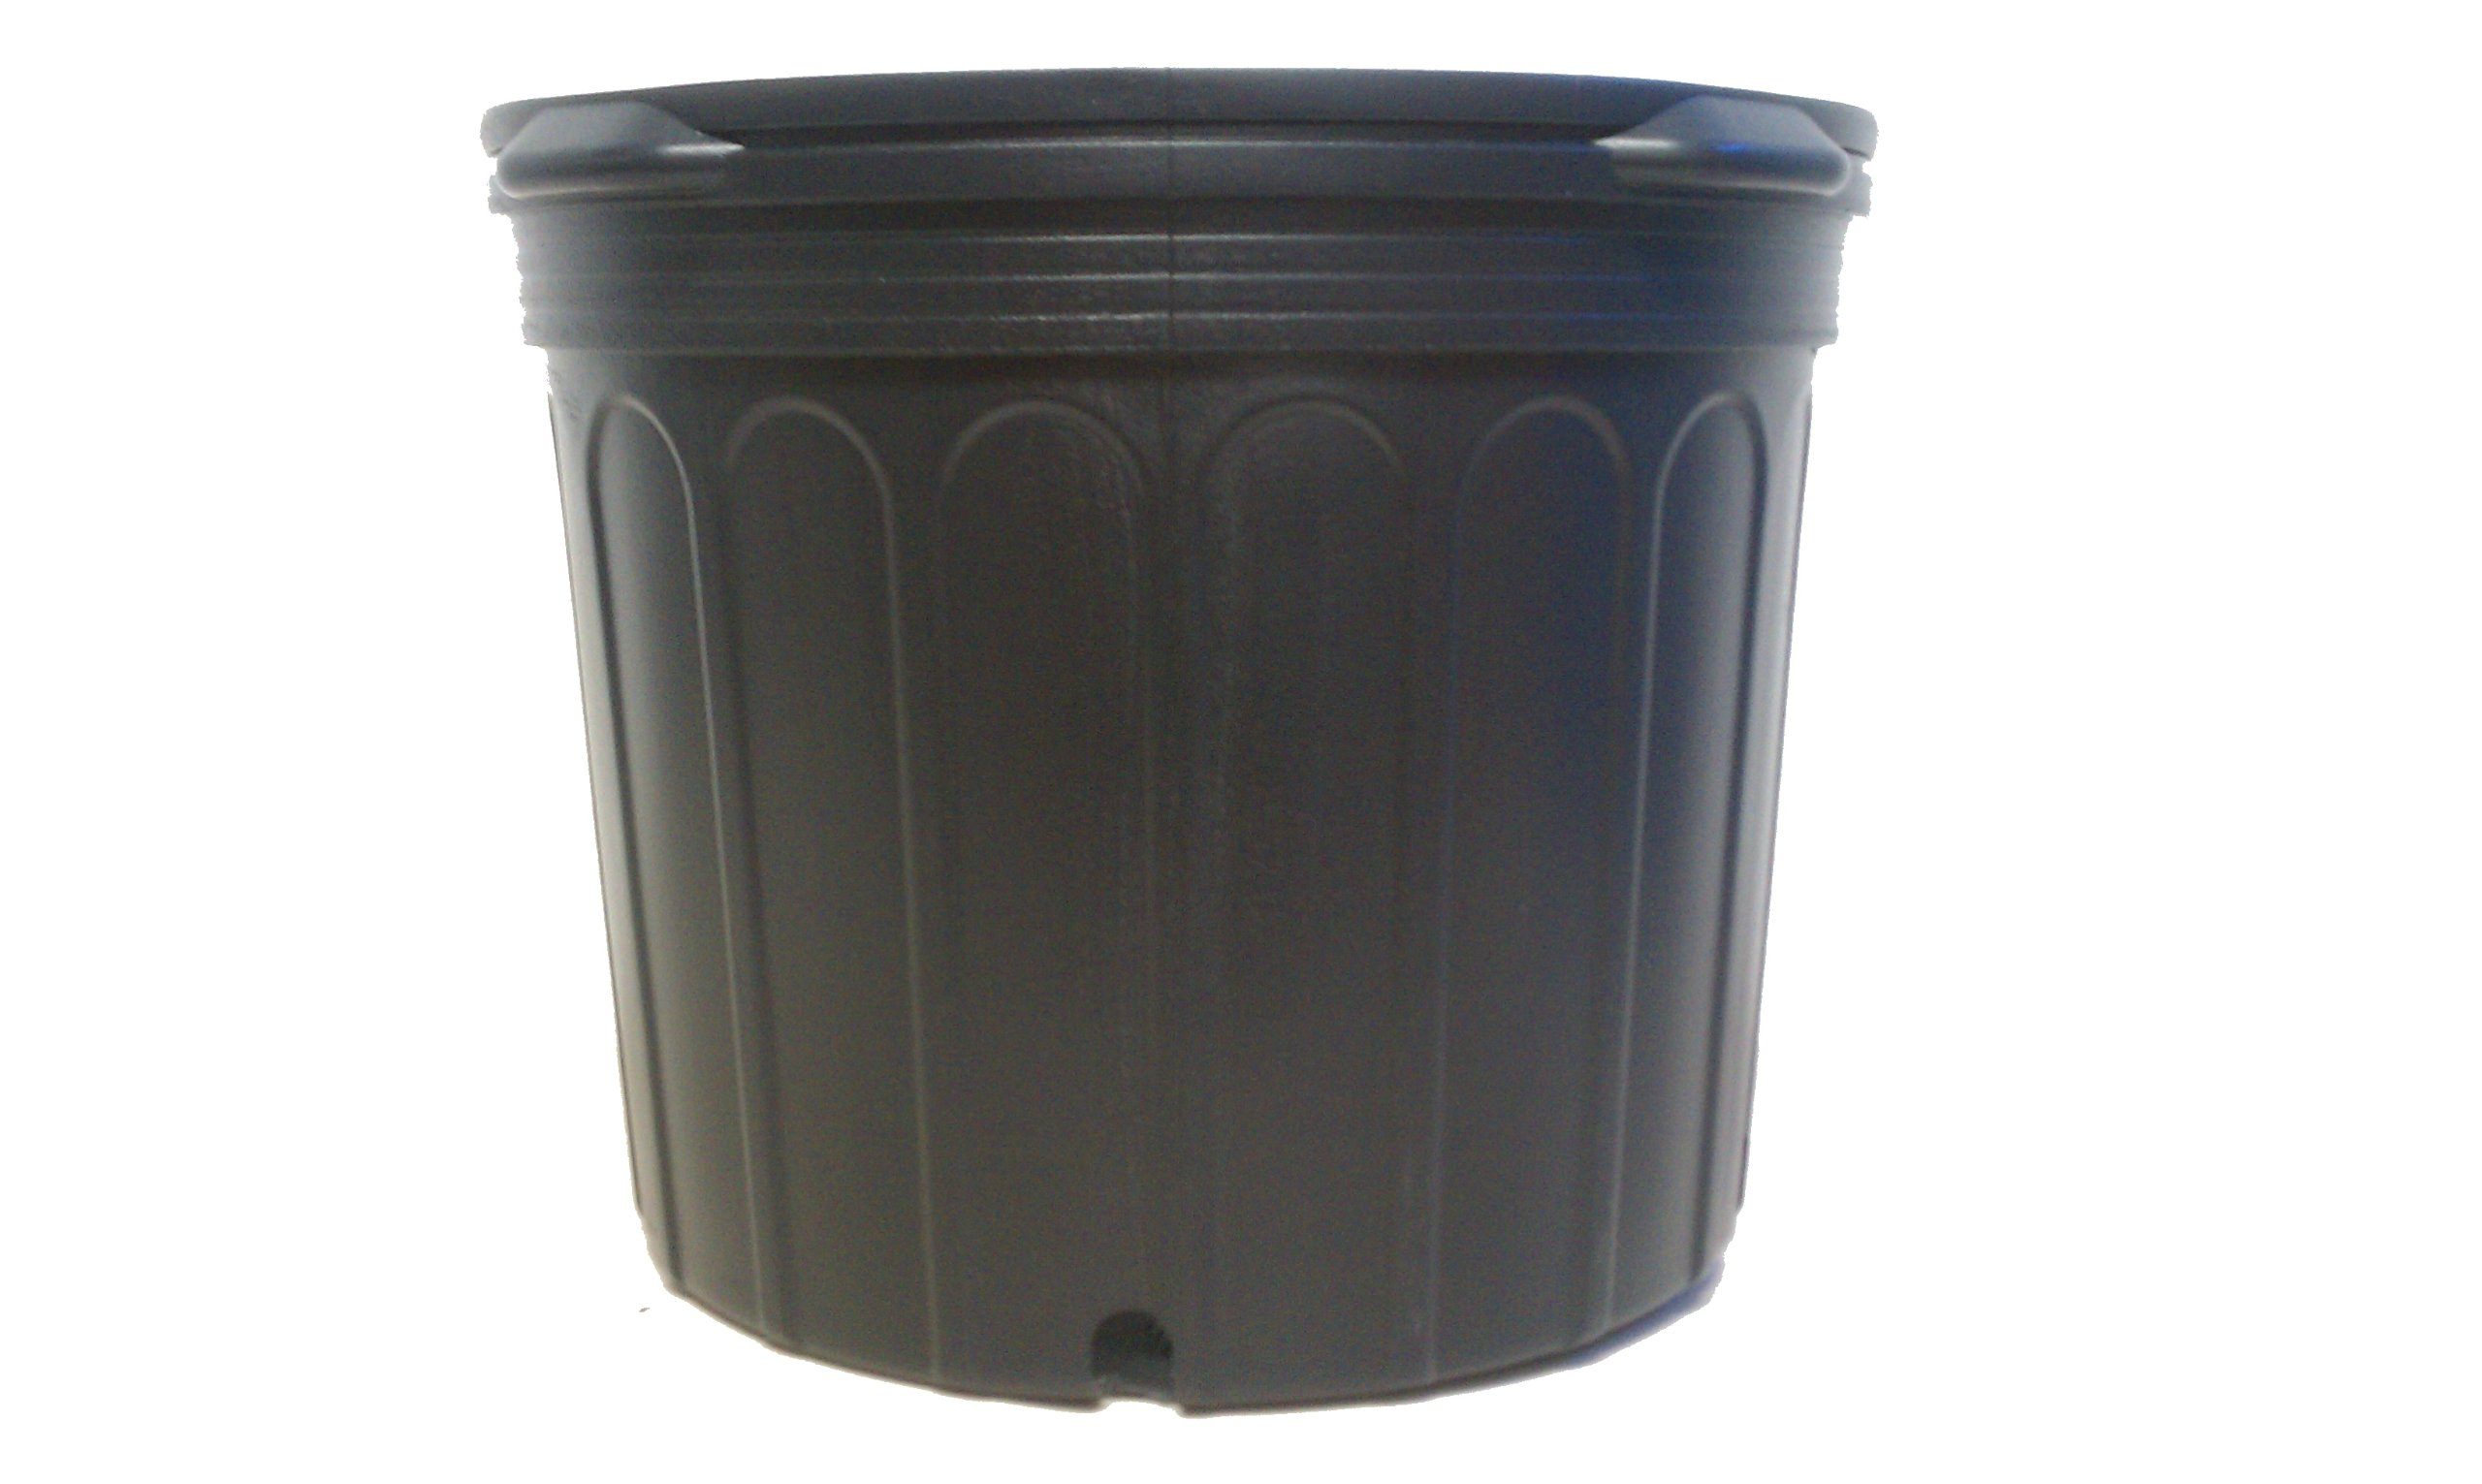 6 NEW Plastic Nursery 7 Gallon Trade POT ~ Actual Volume: 5.8 Gallons